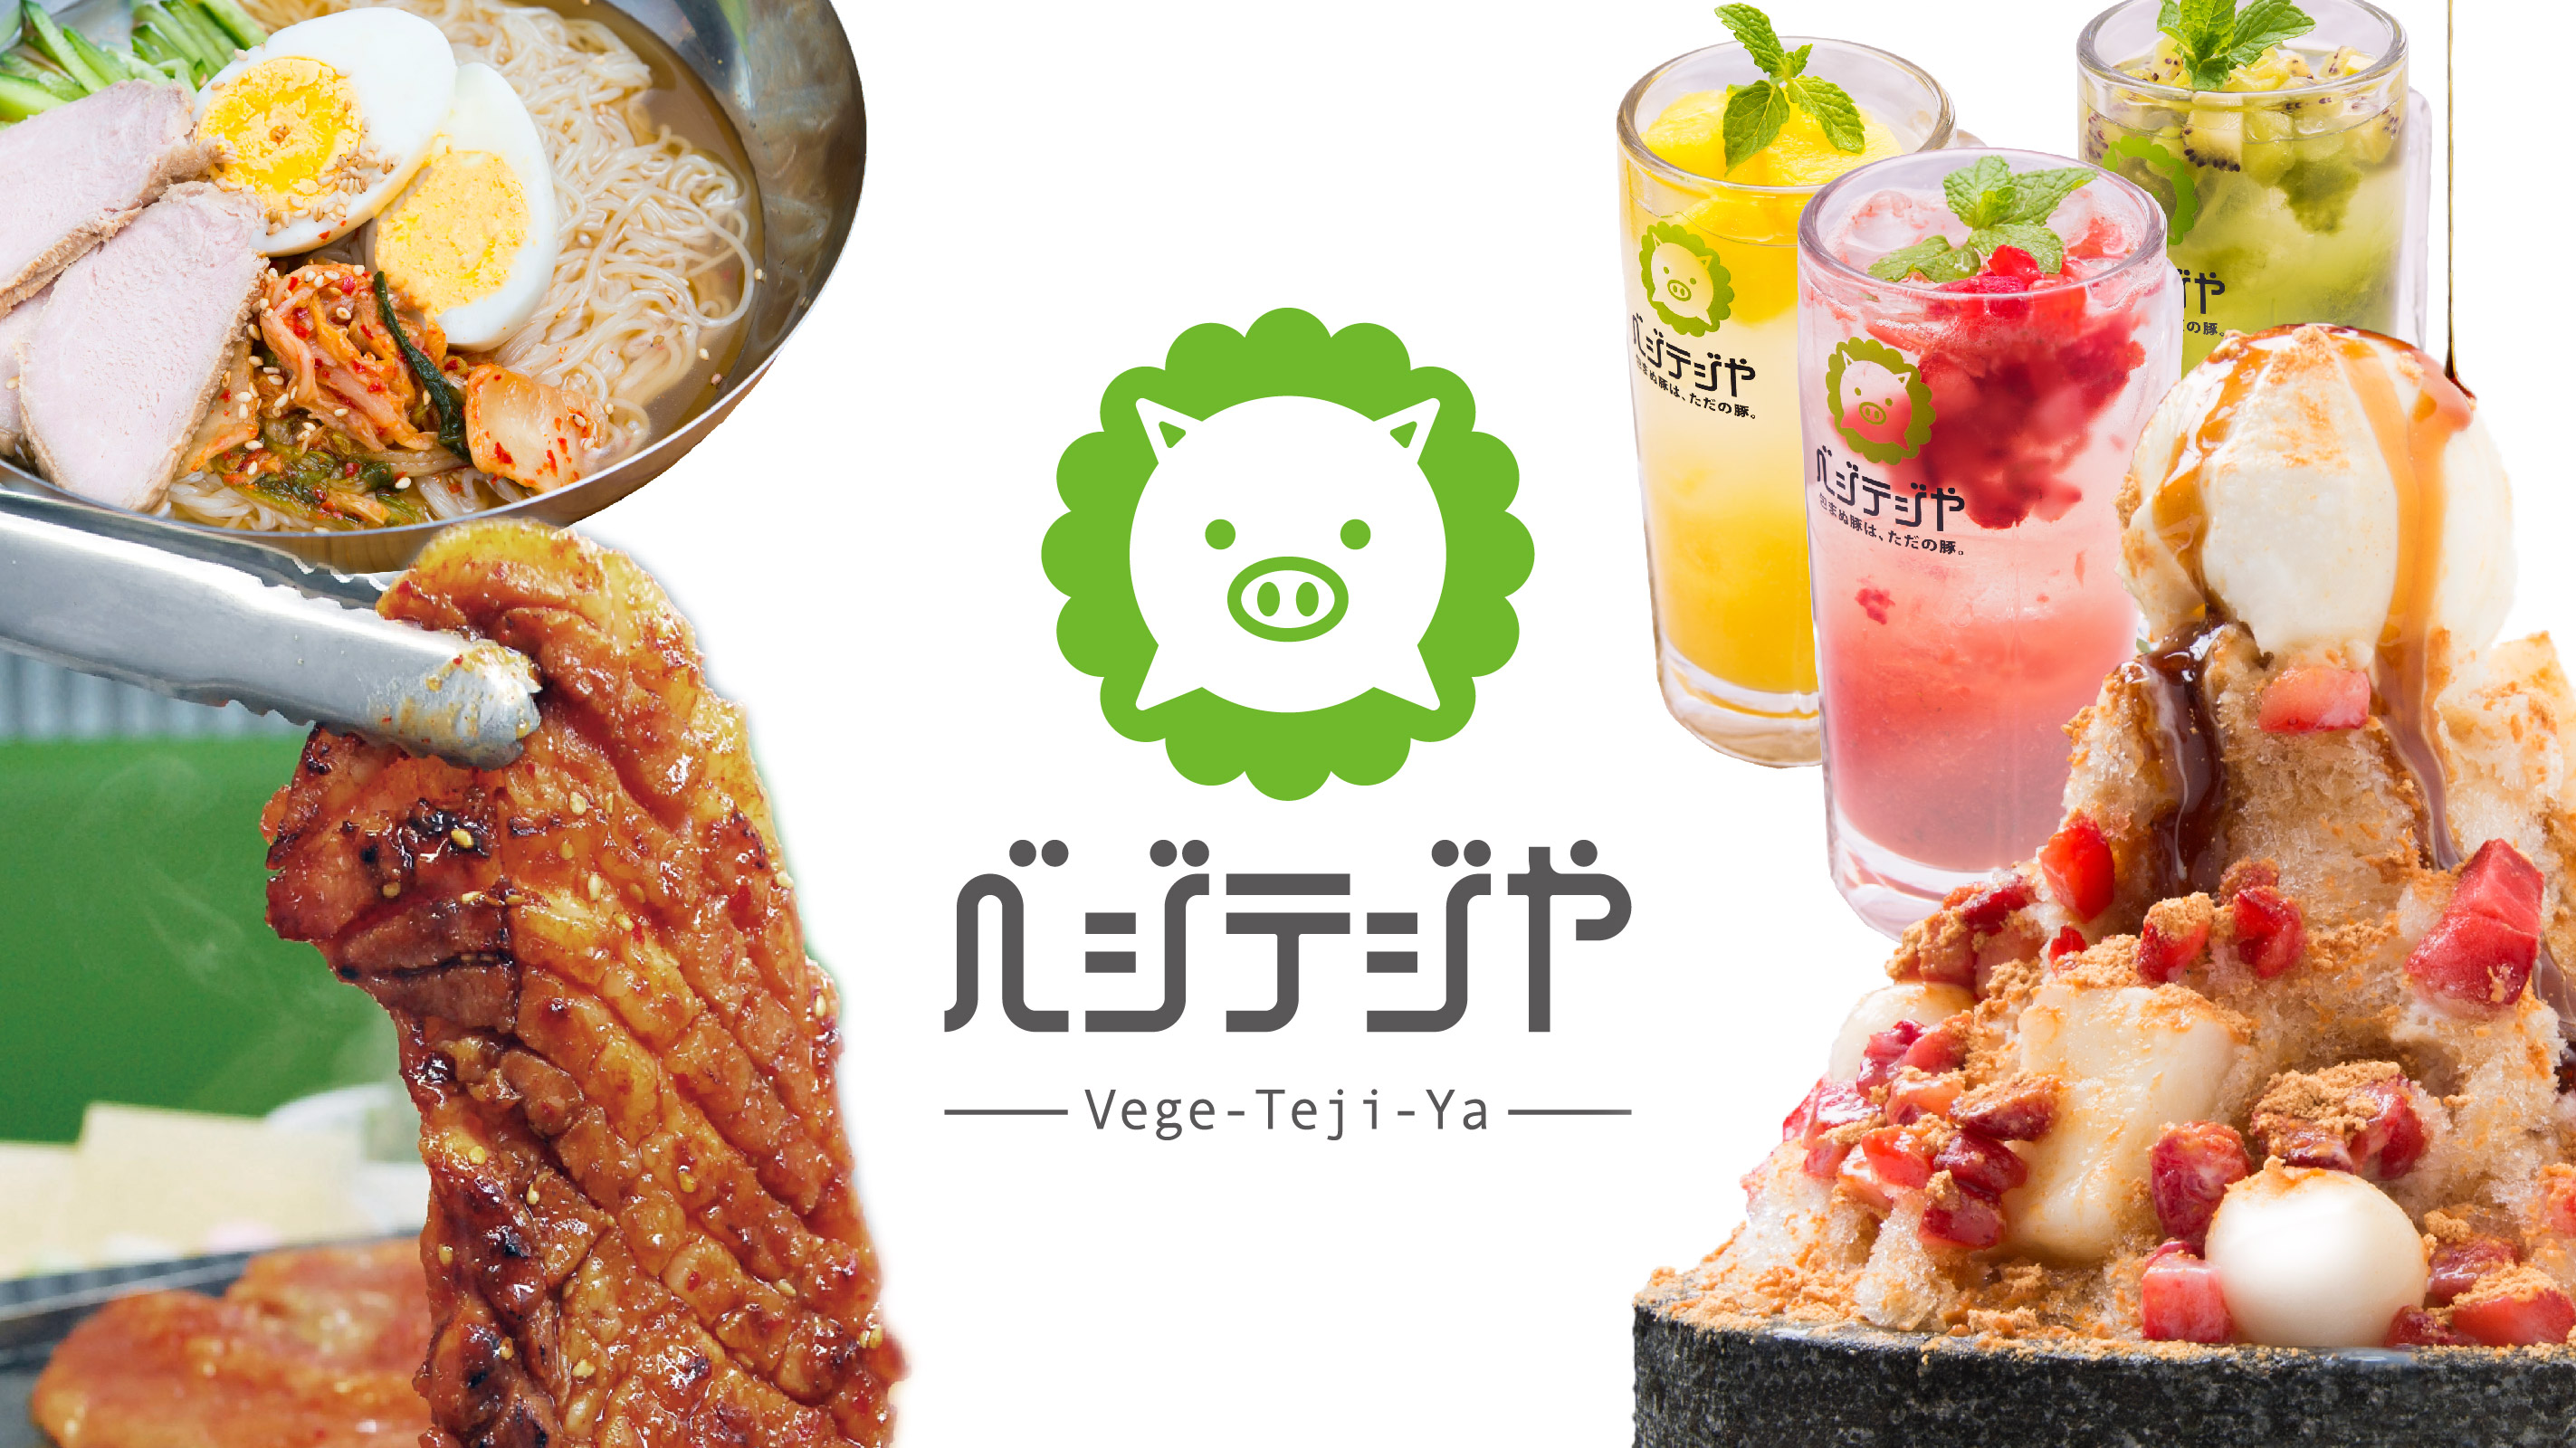 【Press Release】「夏スイーツ」「夏麺」「夏カクテル」サムギョプサル専門店「ベジテジや」に熱い夏がやってきた!7月1日(土)から期間限定で『夏の三大名物フェア』を開催!